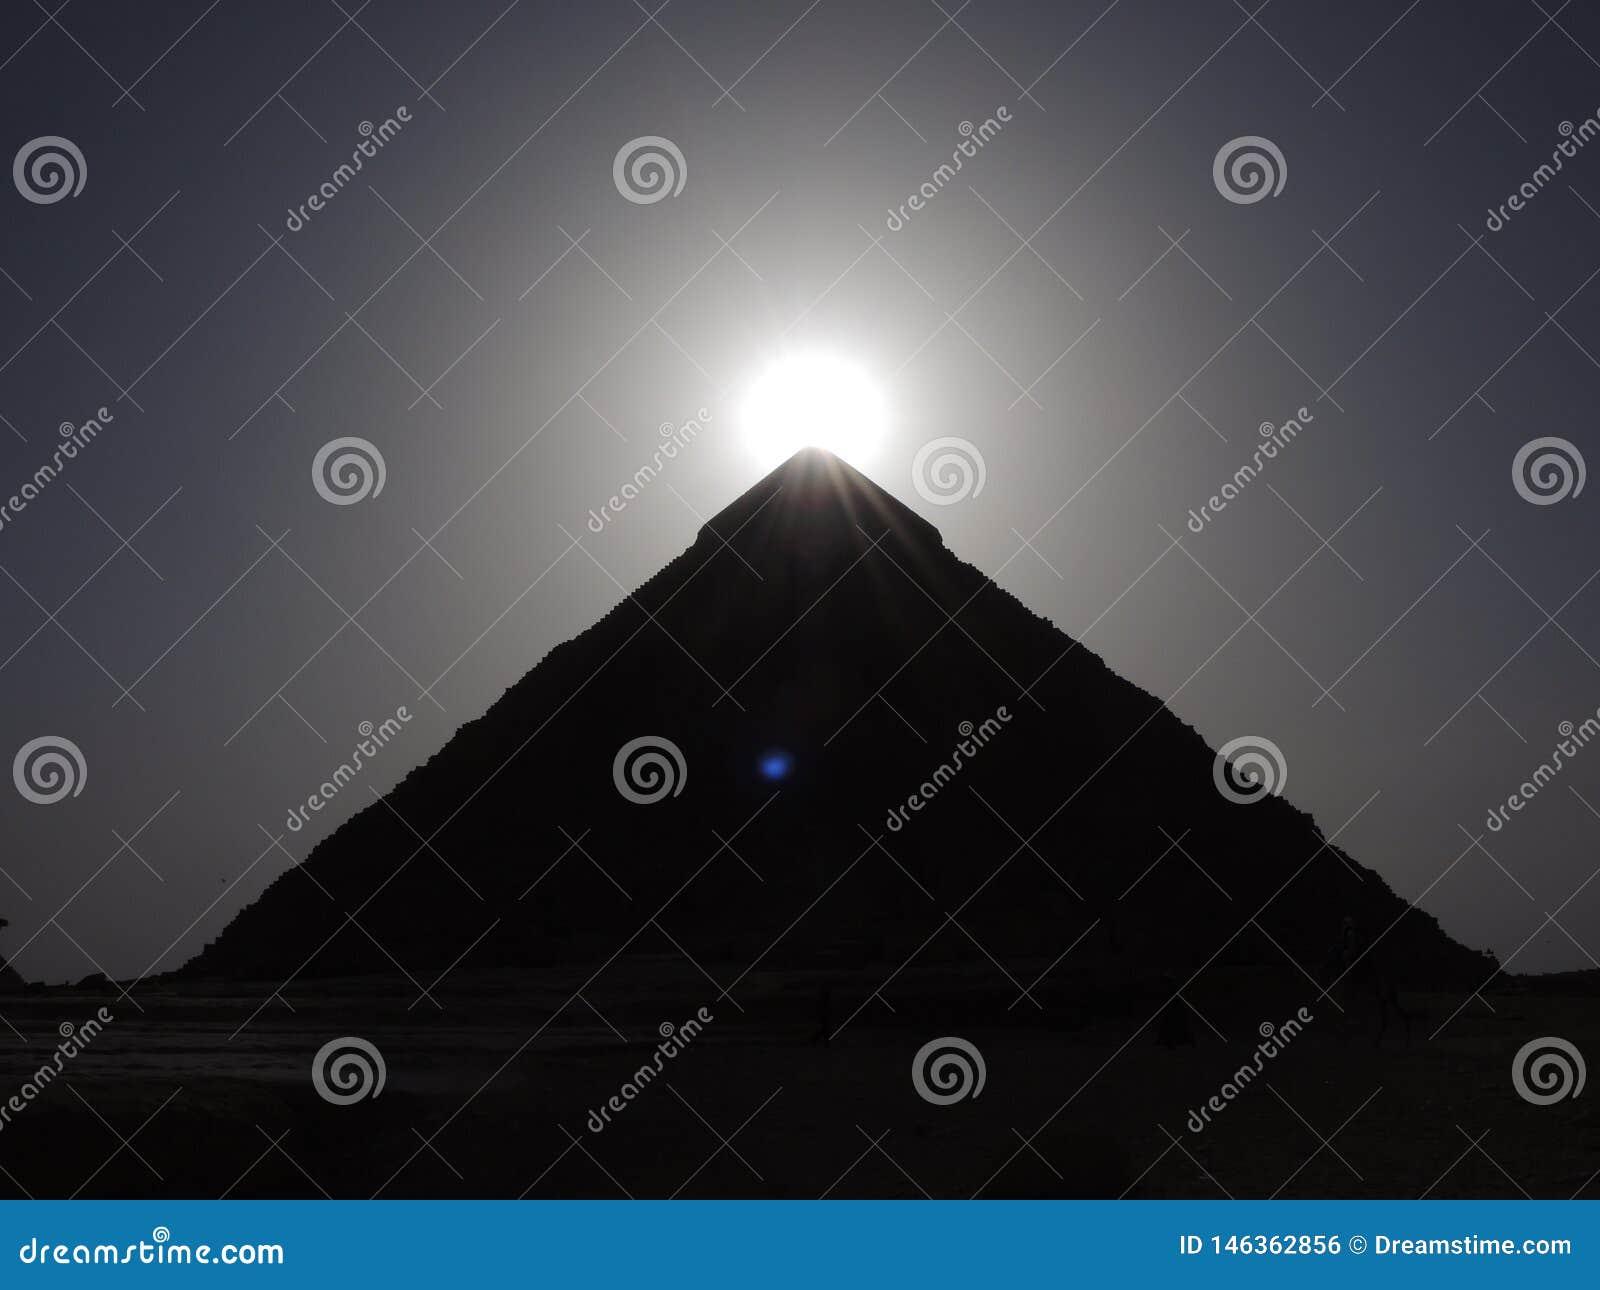 Pyramid of Kefren in Egypt